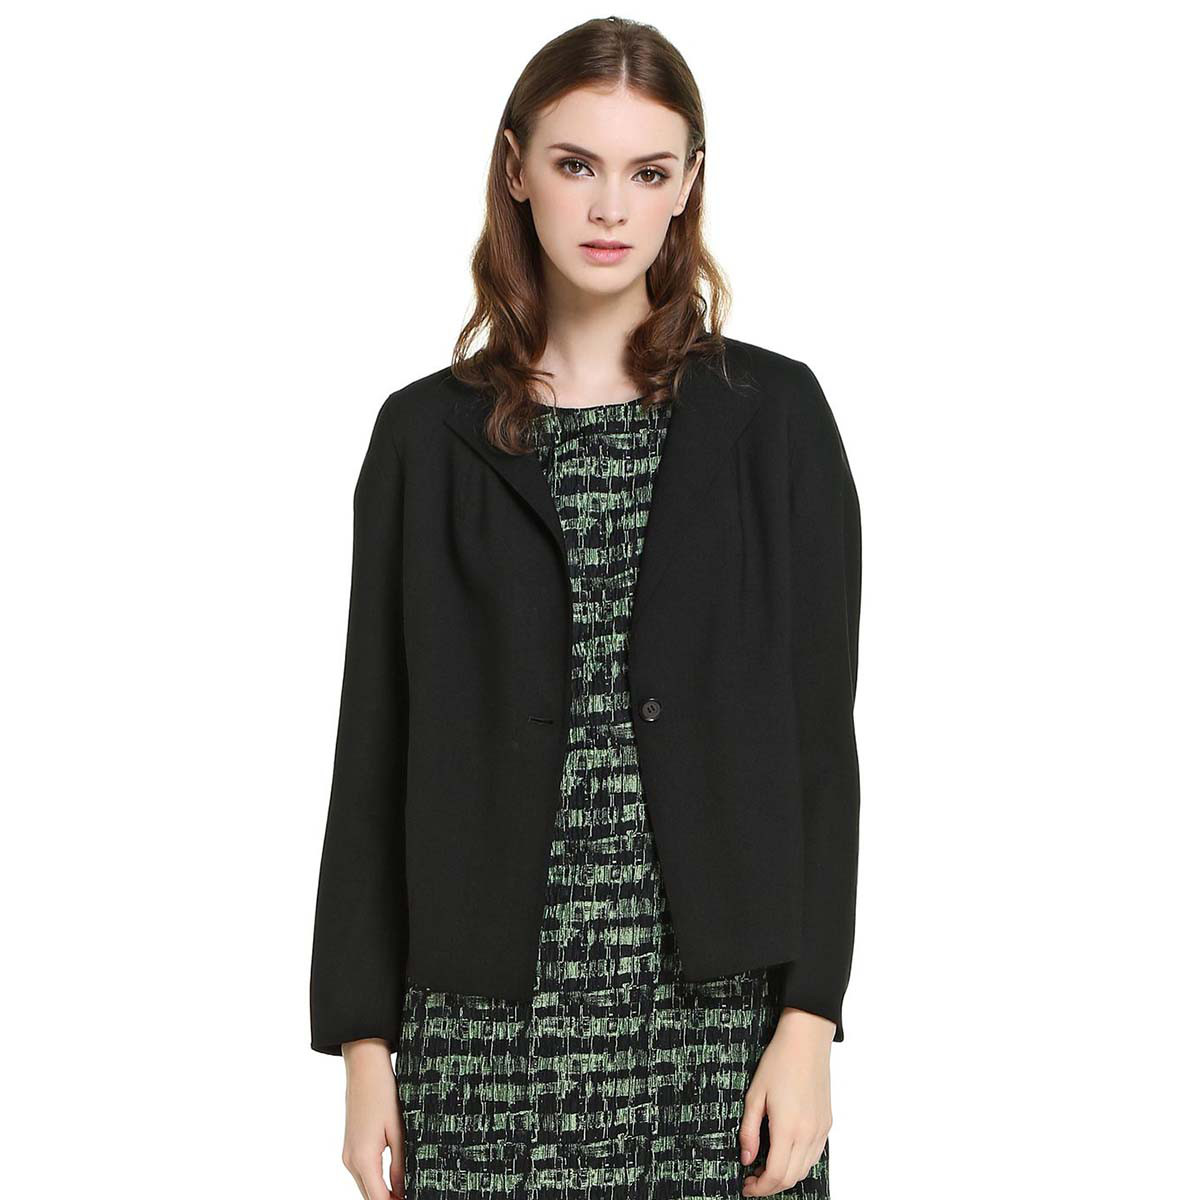 ANTEPRIMAANTEPRIMA女款短款羊毛长袖薄外套NW14S6411100NERO